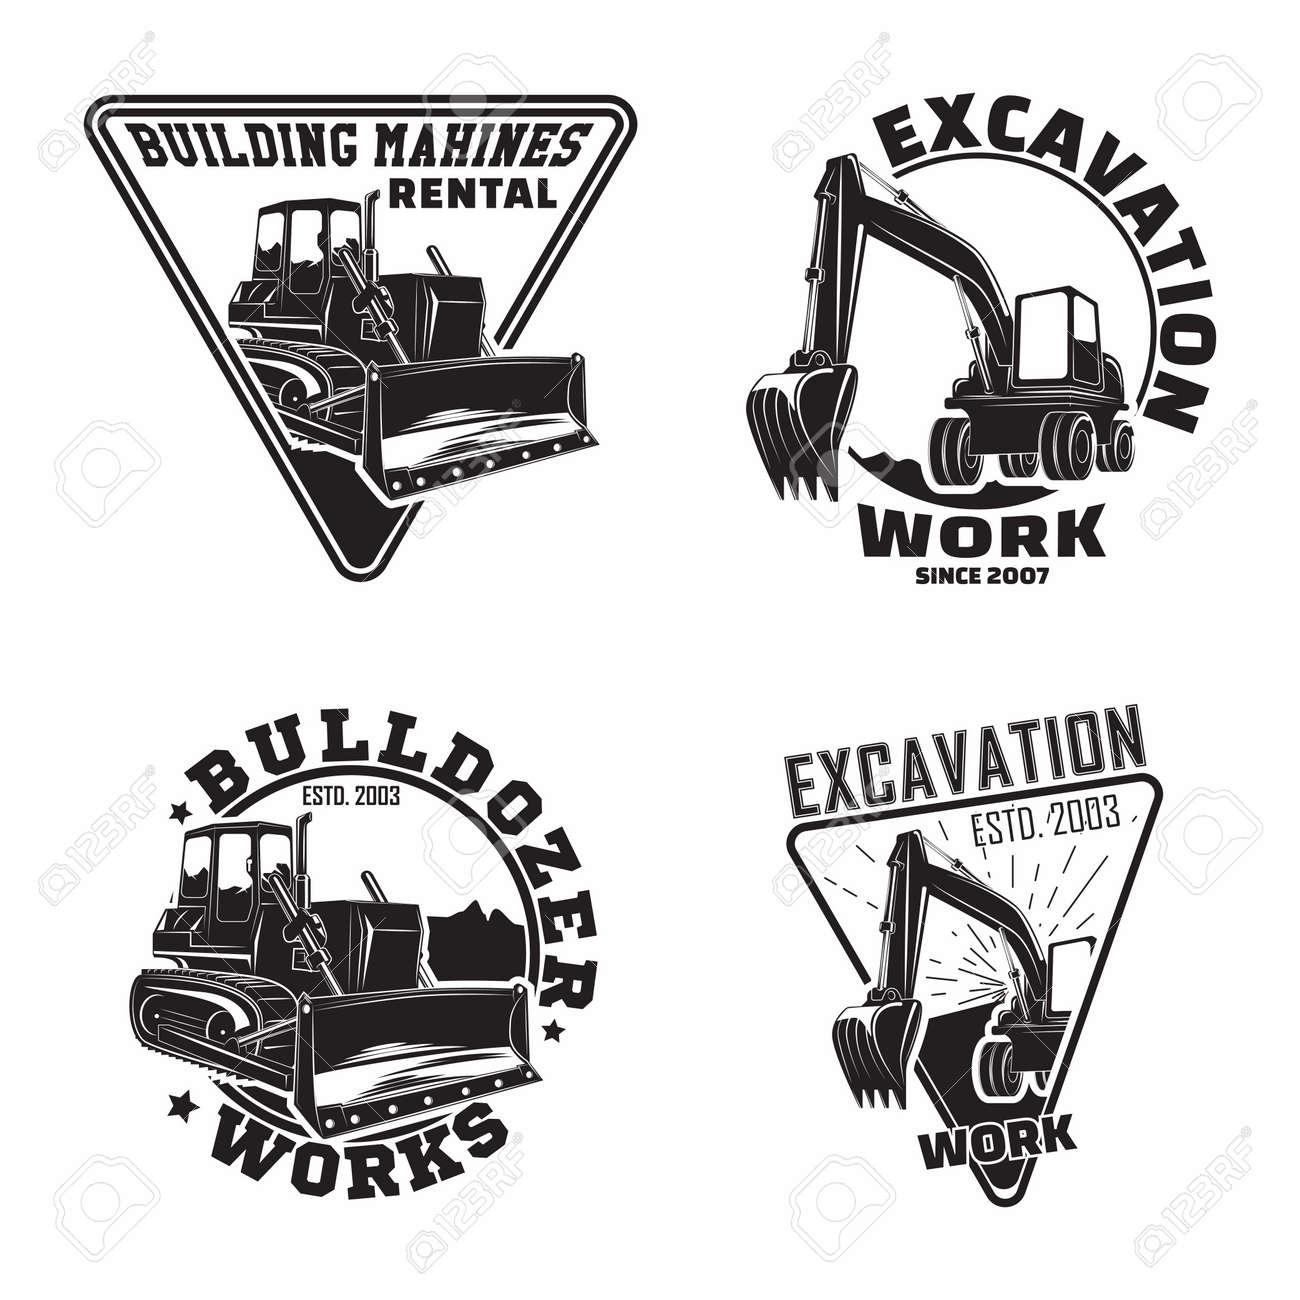 Set of Excavation work emblems design, emblems of bulldozer or building machine rental organization print stamps, constructing equipment, Heavy bulldozer machine typographyv emblems, Vector - 154820113